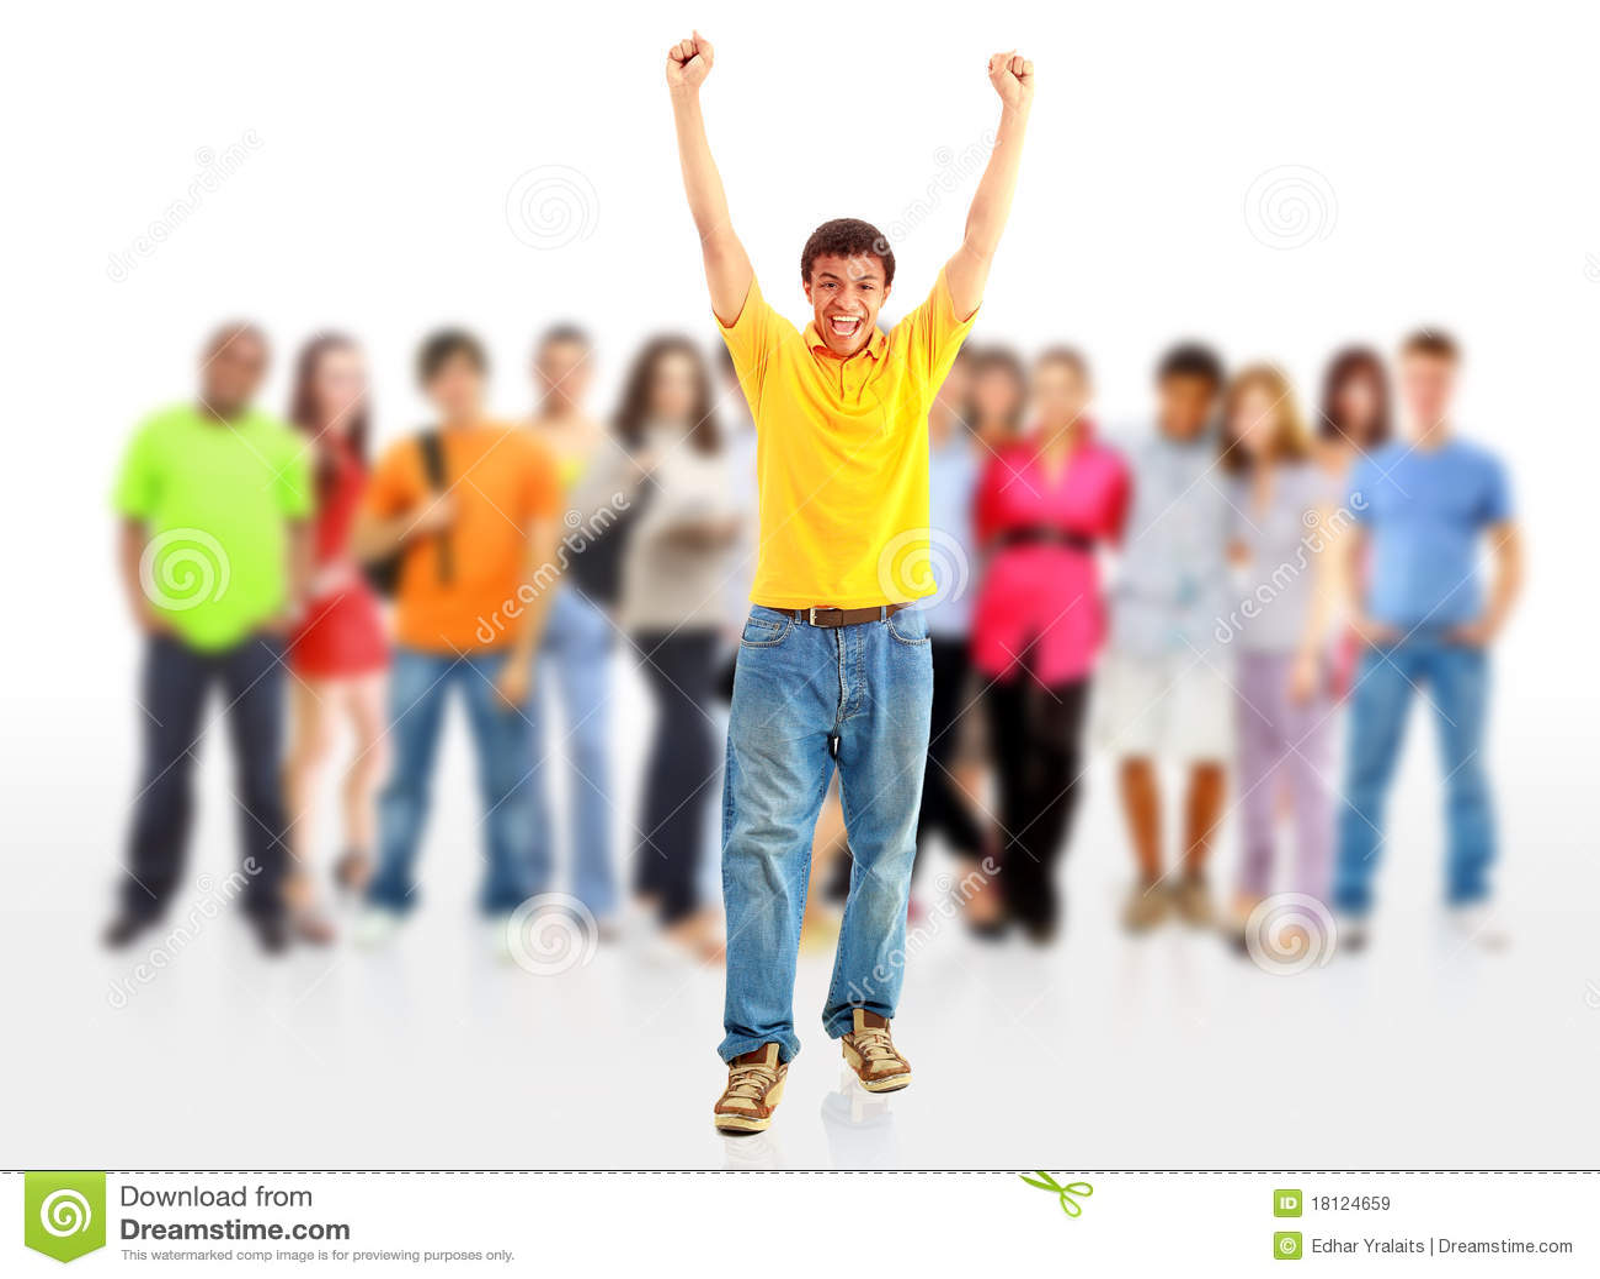 group-casual-happy-people-smiling-18124659.jpg